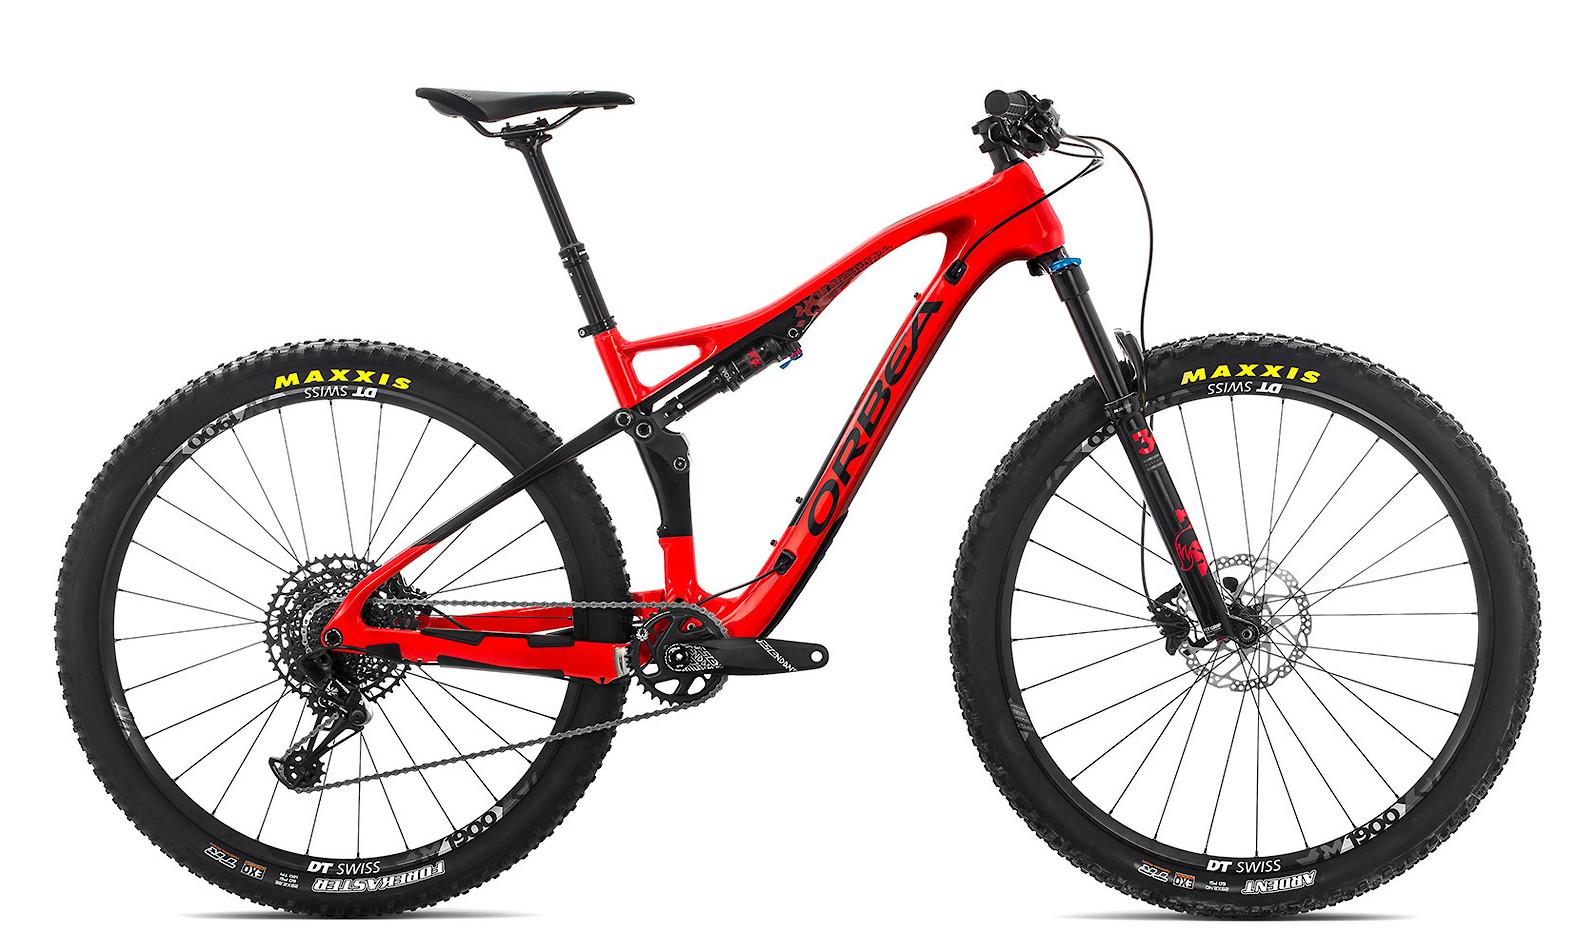 2019 Orbea Occam TR M30 Bike